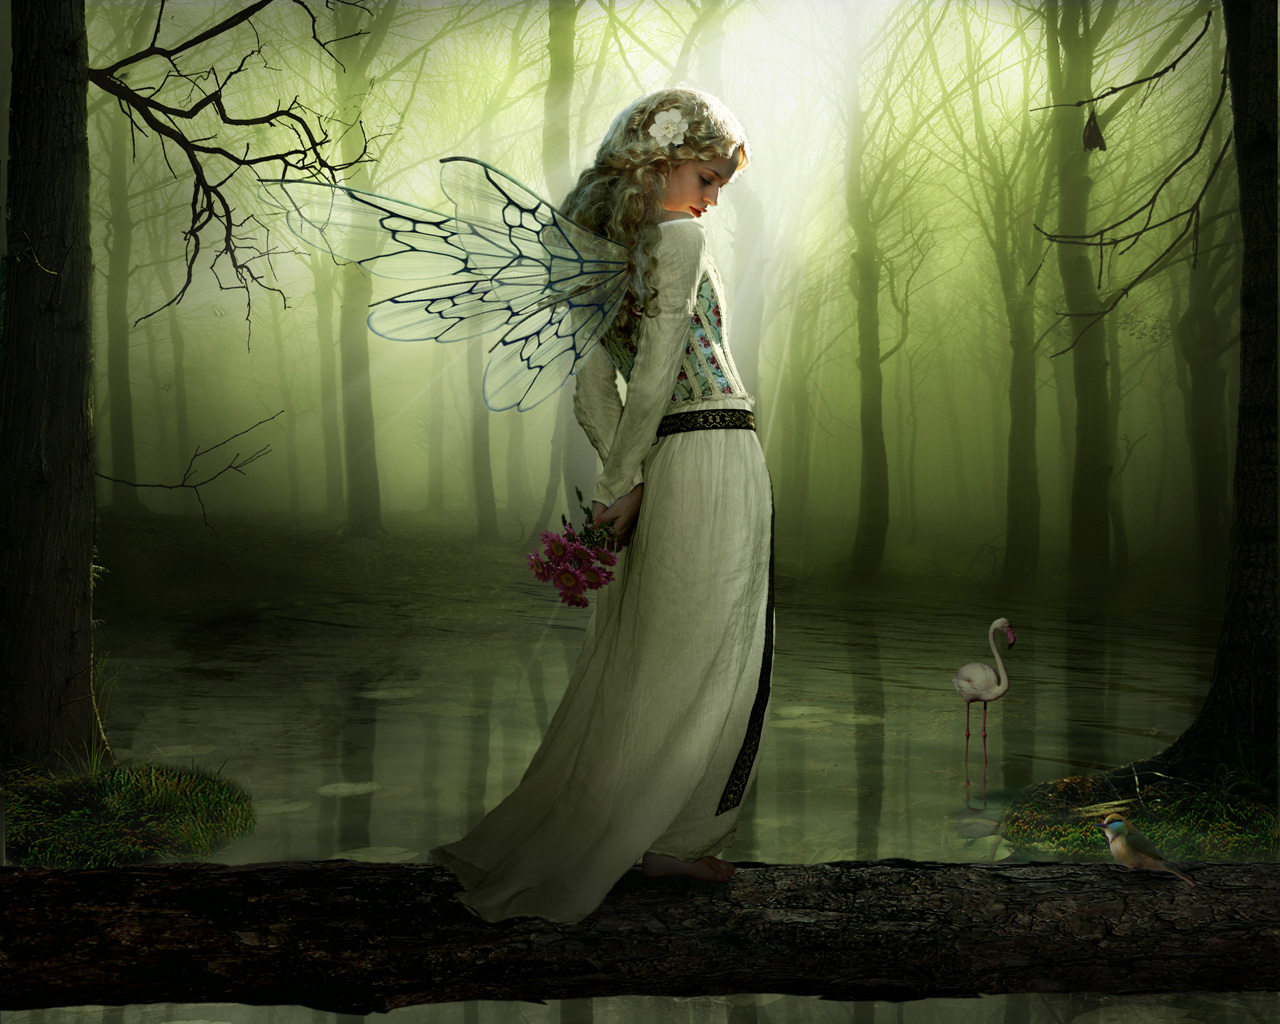 http://fc07.deviantart.net/fs38/f/2008/327/5/d/Green_Fairy_WP_by_Pygar.jpg